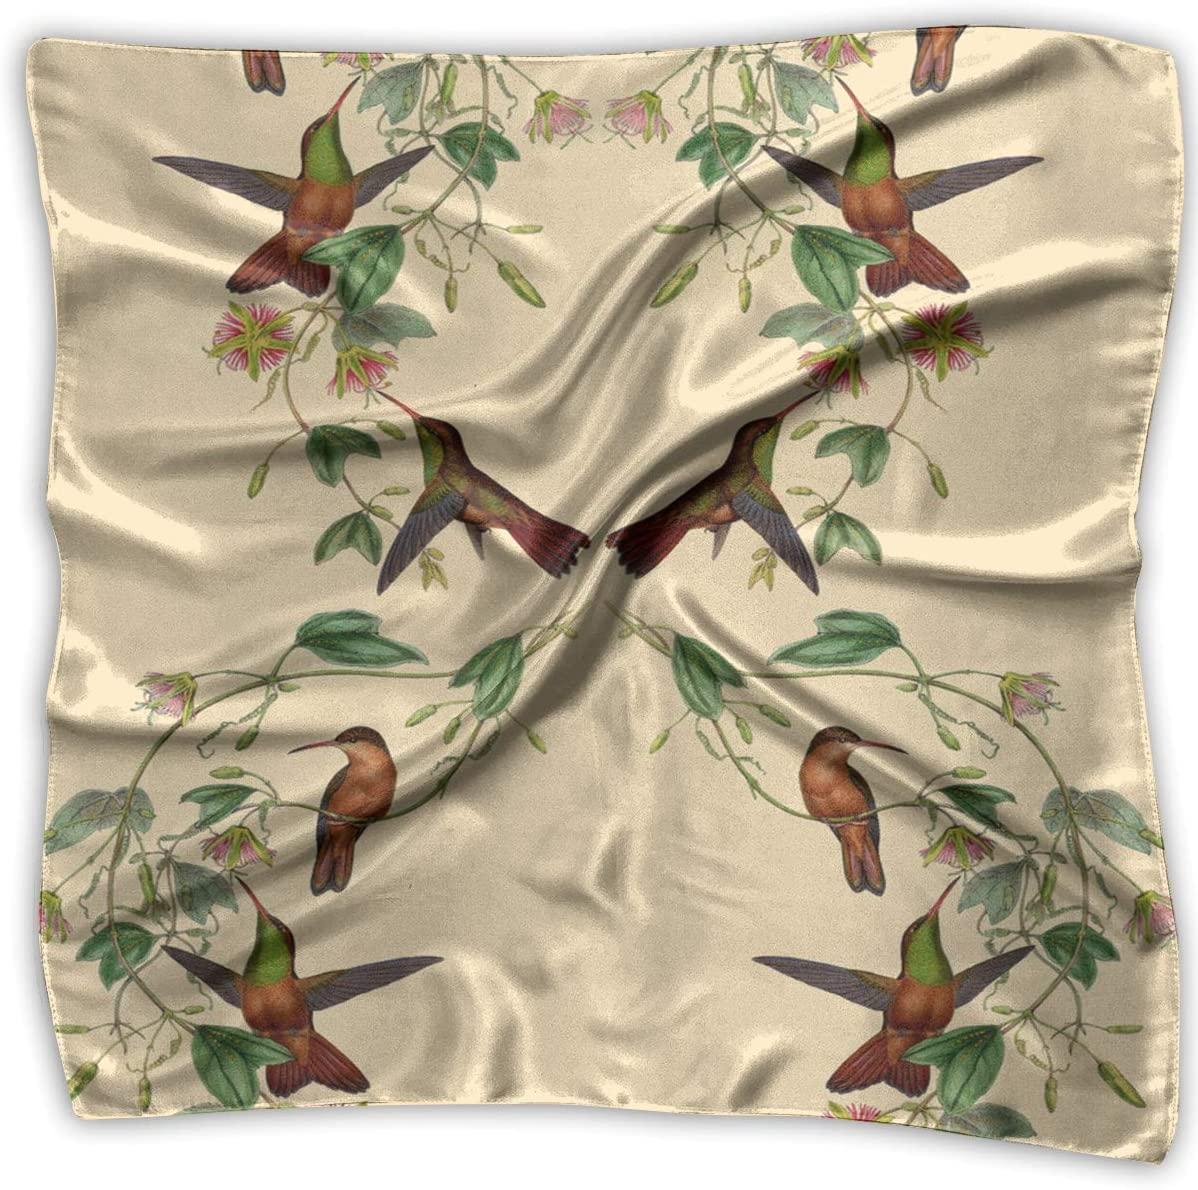 WFIRE Hummingbird Bird Square Handkerchiefs Scarf Shawl Bandanas Headscarf Neckerchief Tie Hair Scarf